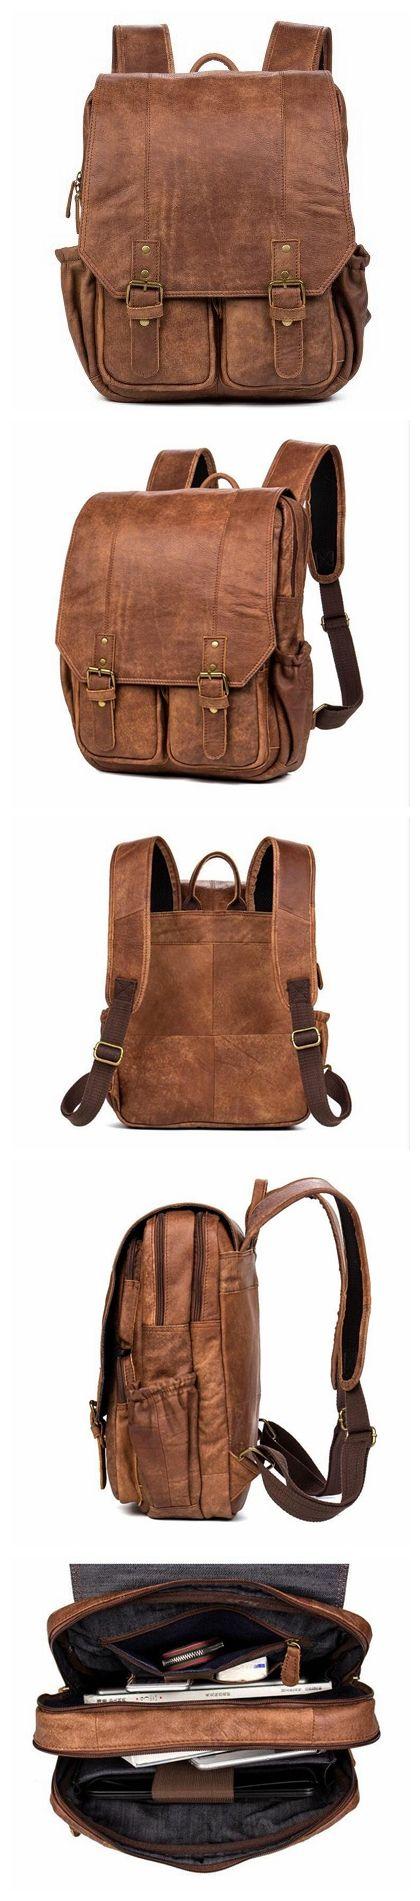 ROCKCOW Handmade Genuine Leather Travel Backpack, Shoulder Backpack, School Backpack B078